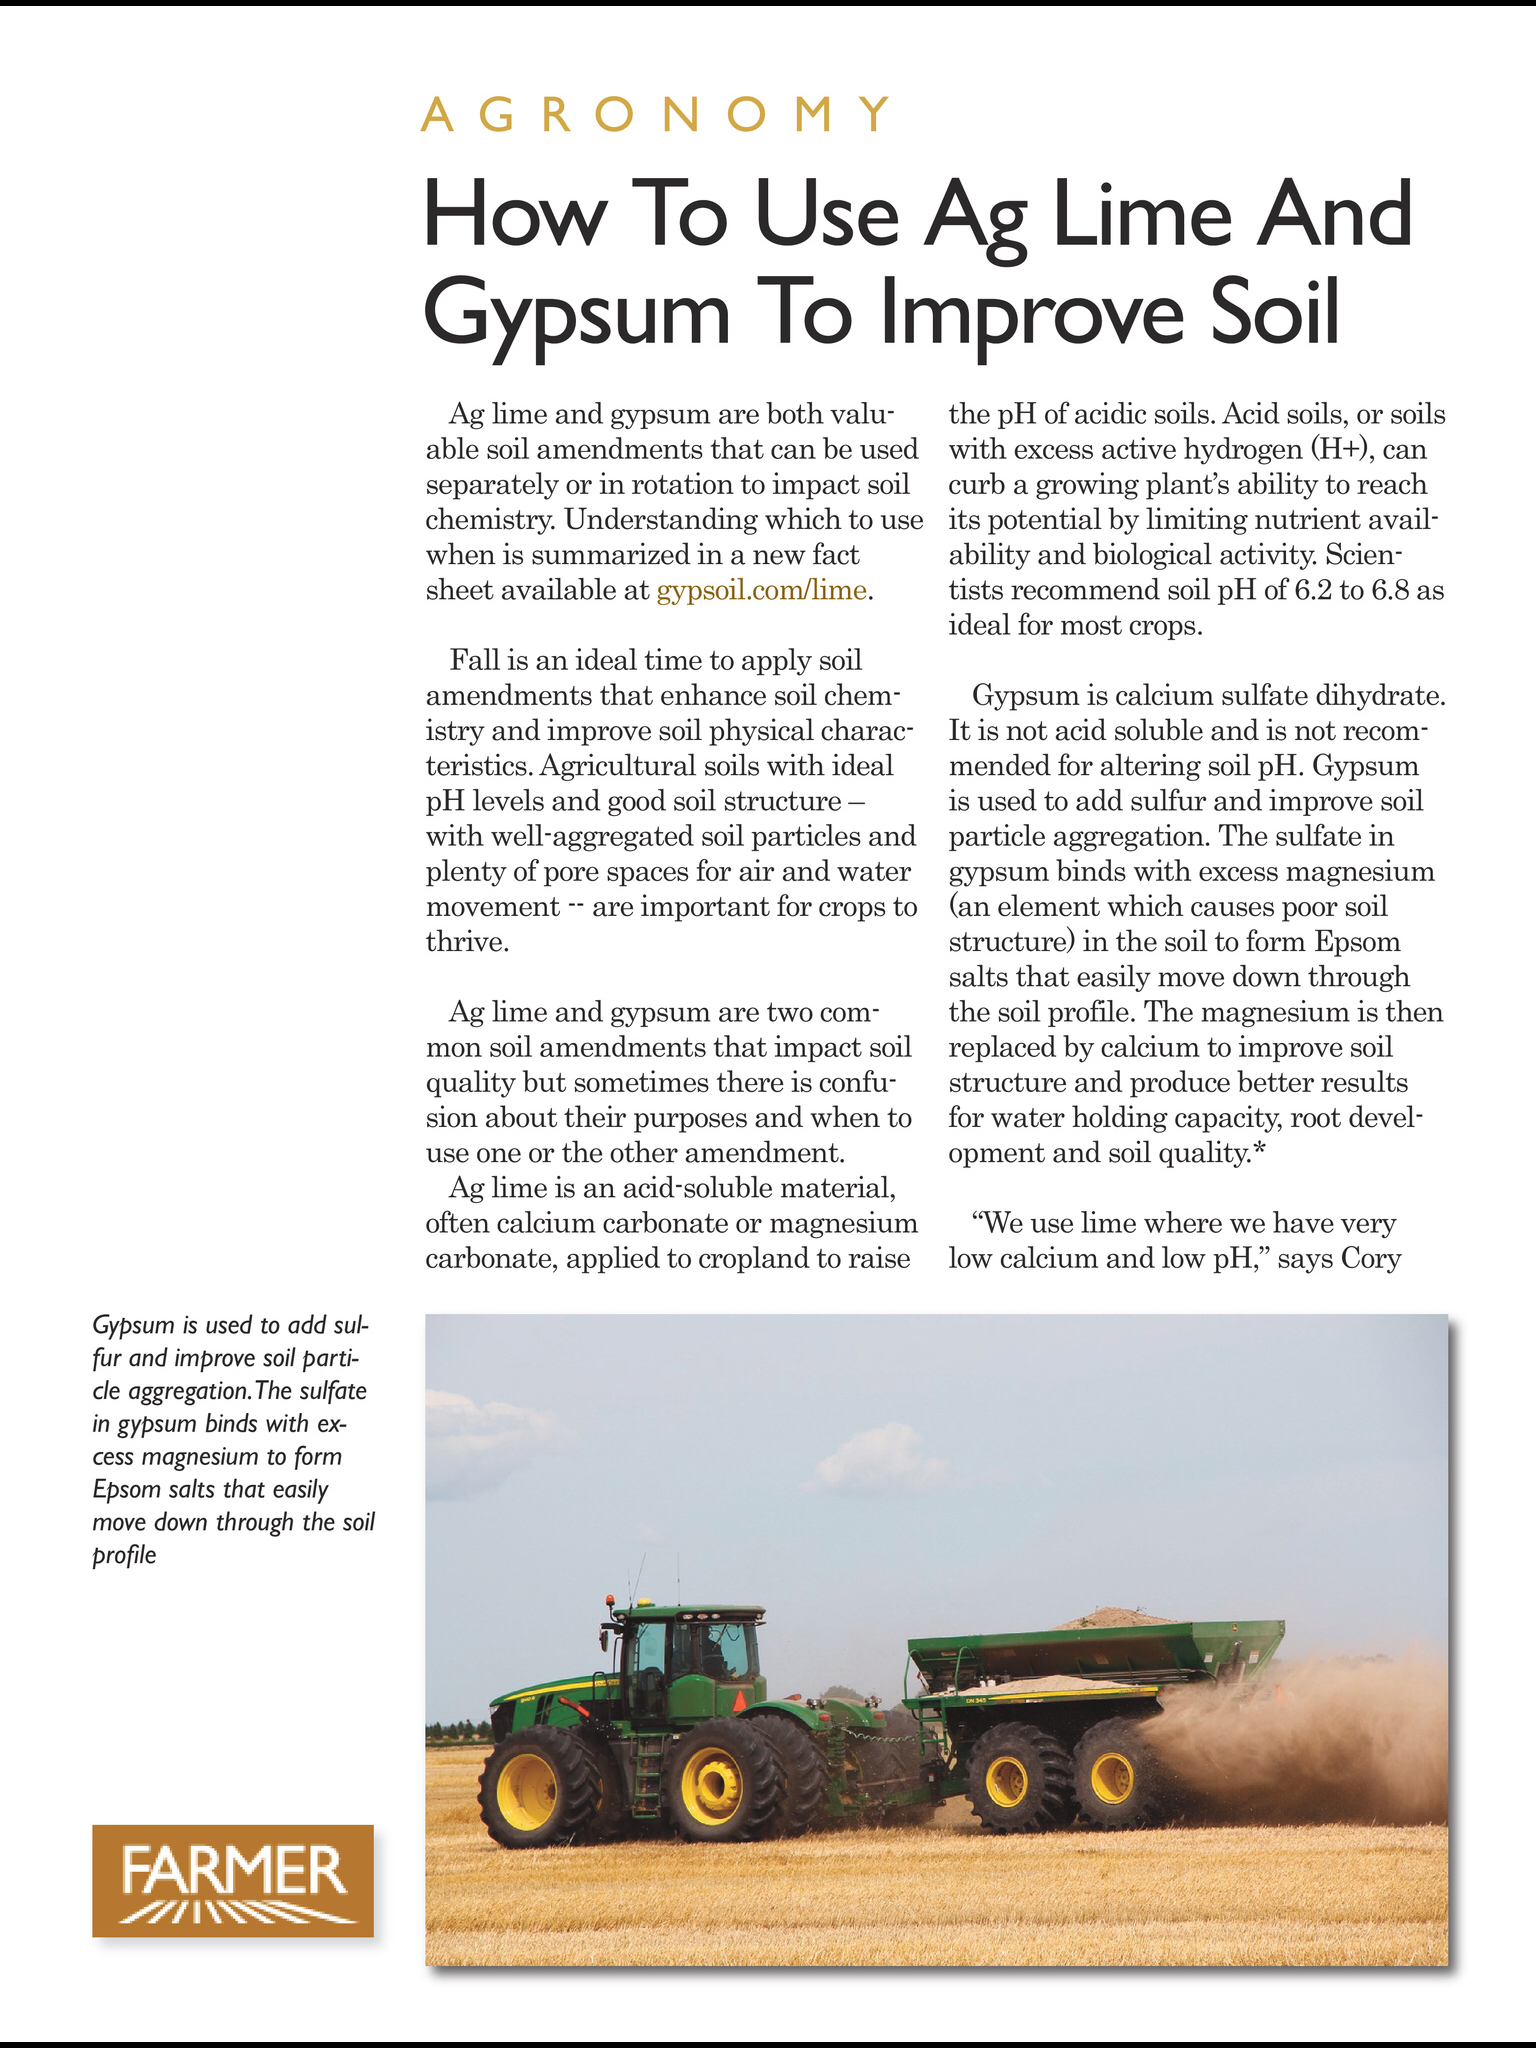 Ag lime article in Farmer magazine